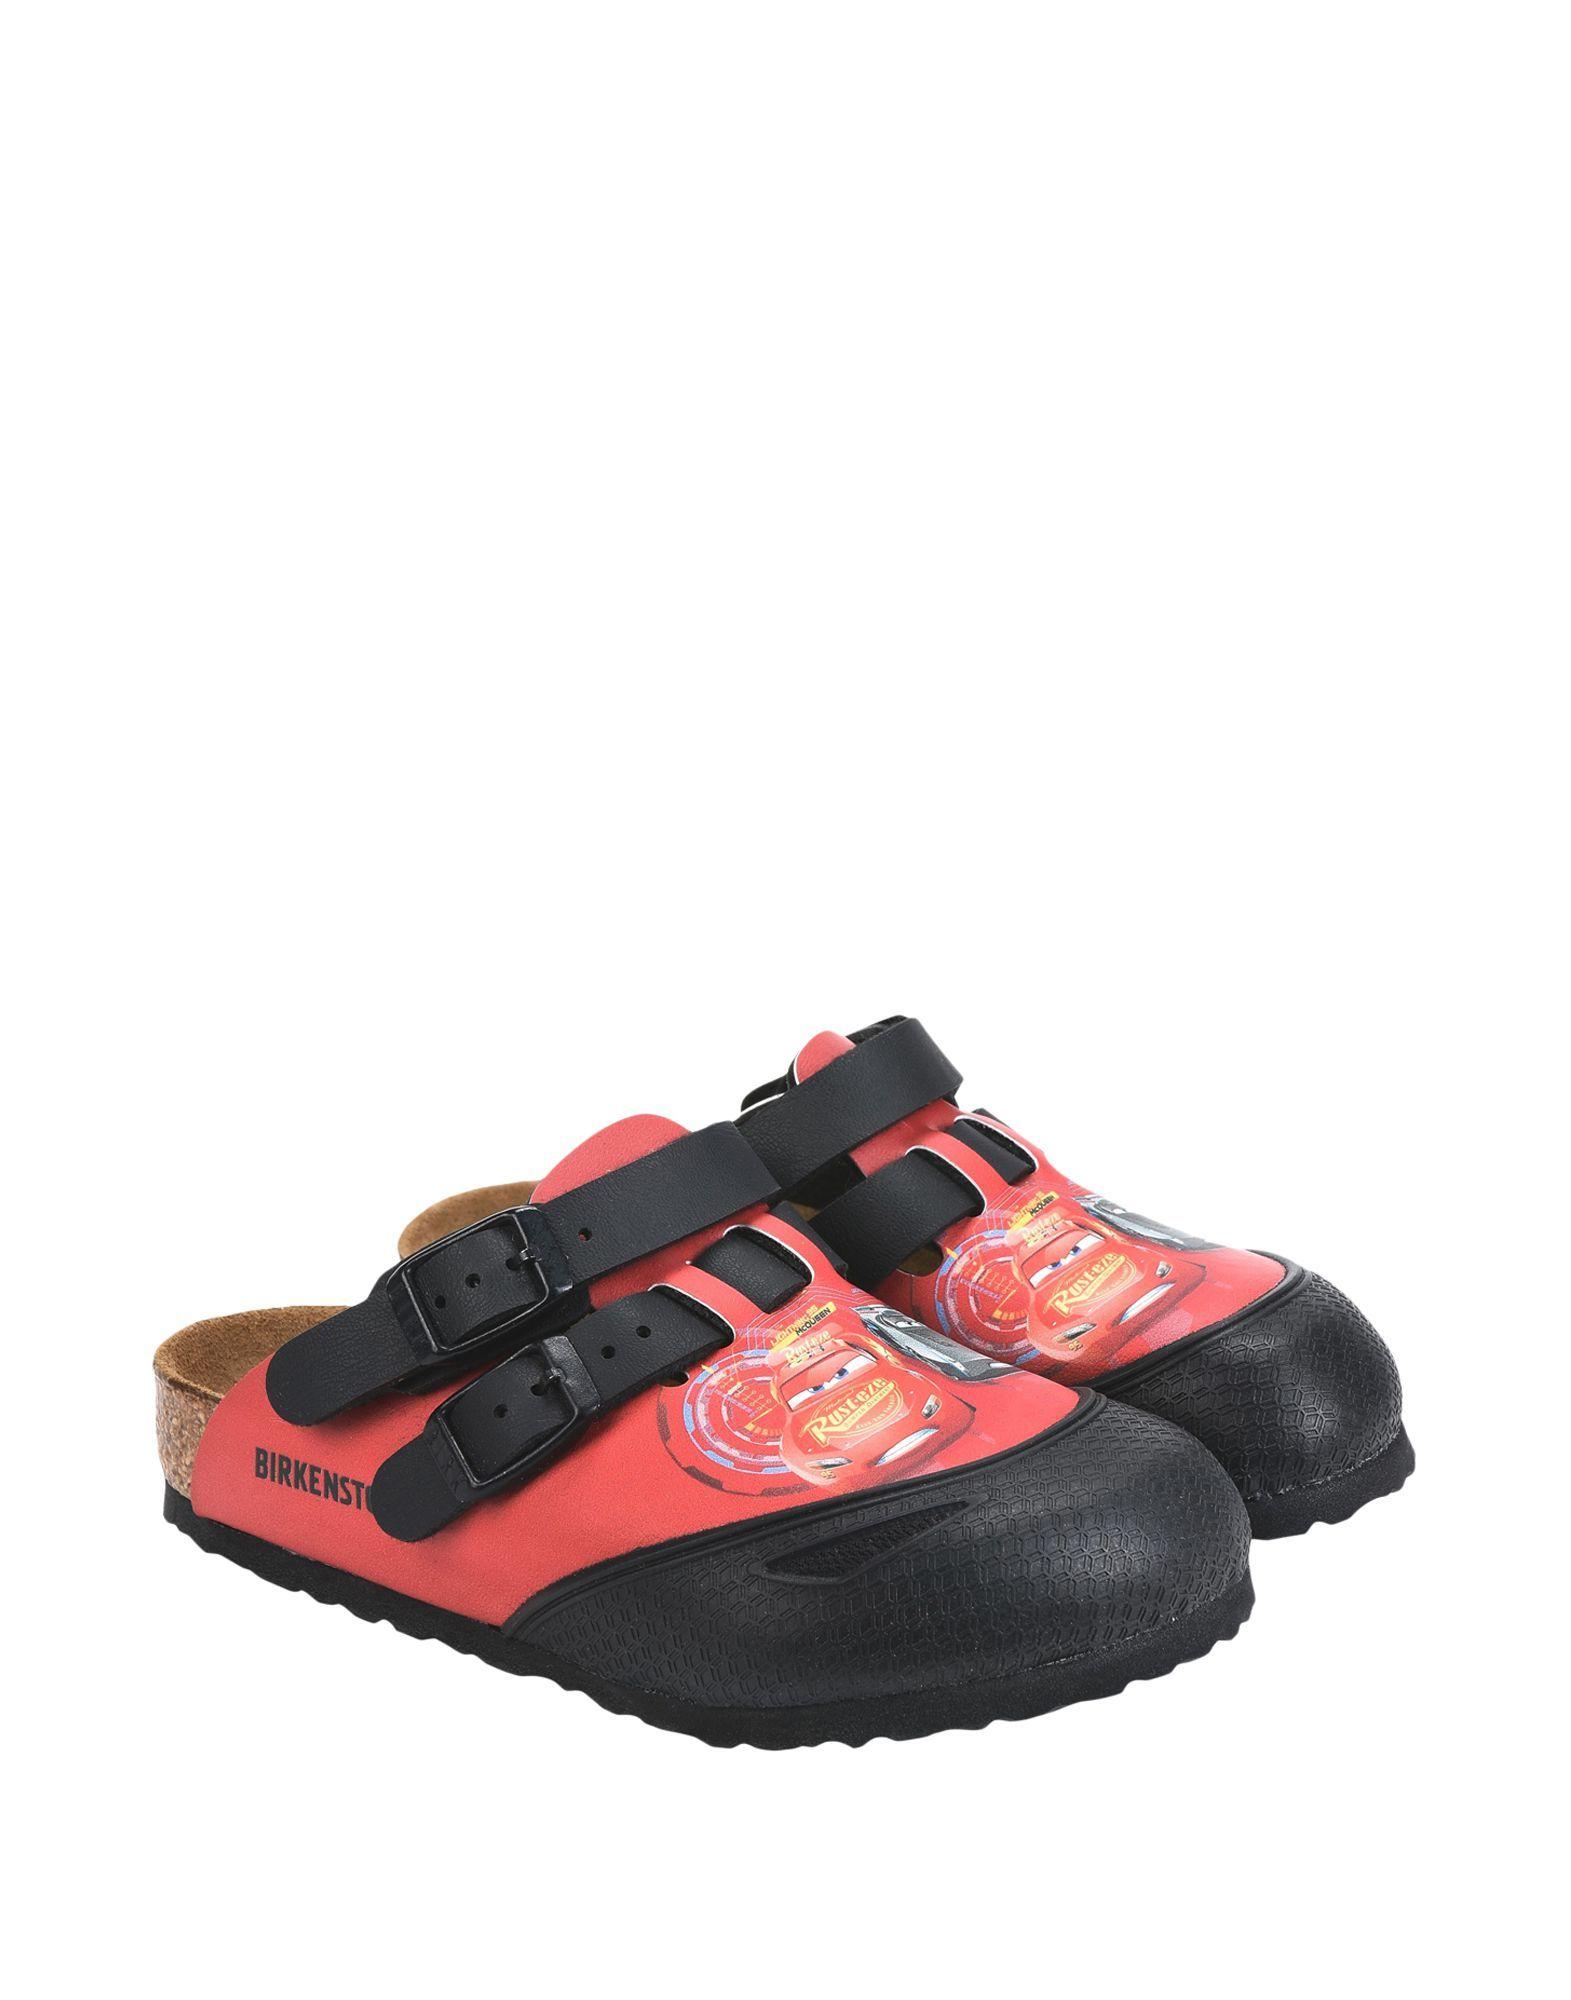 Birkenstock Red Boy Shoes